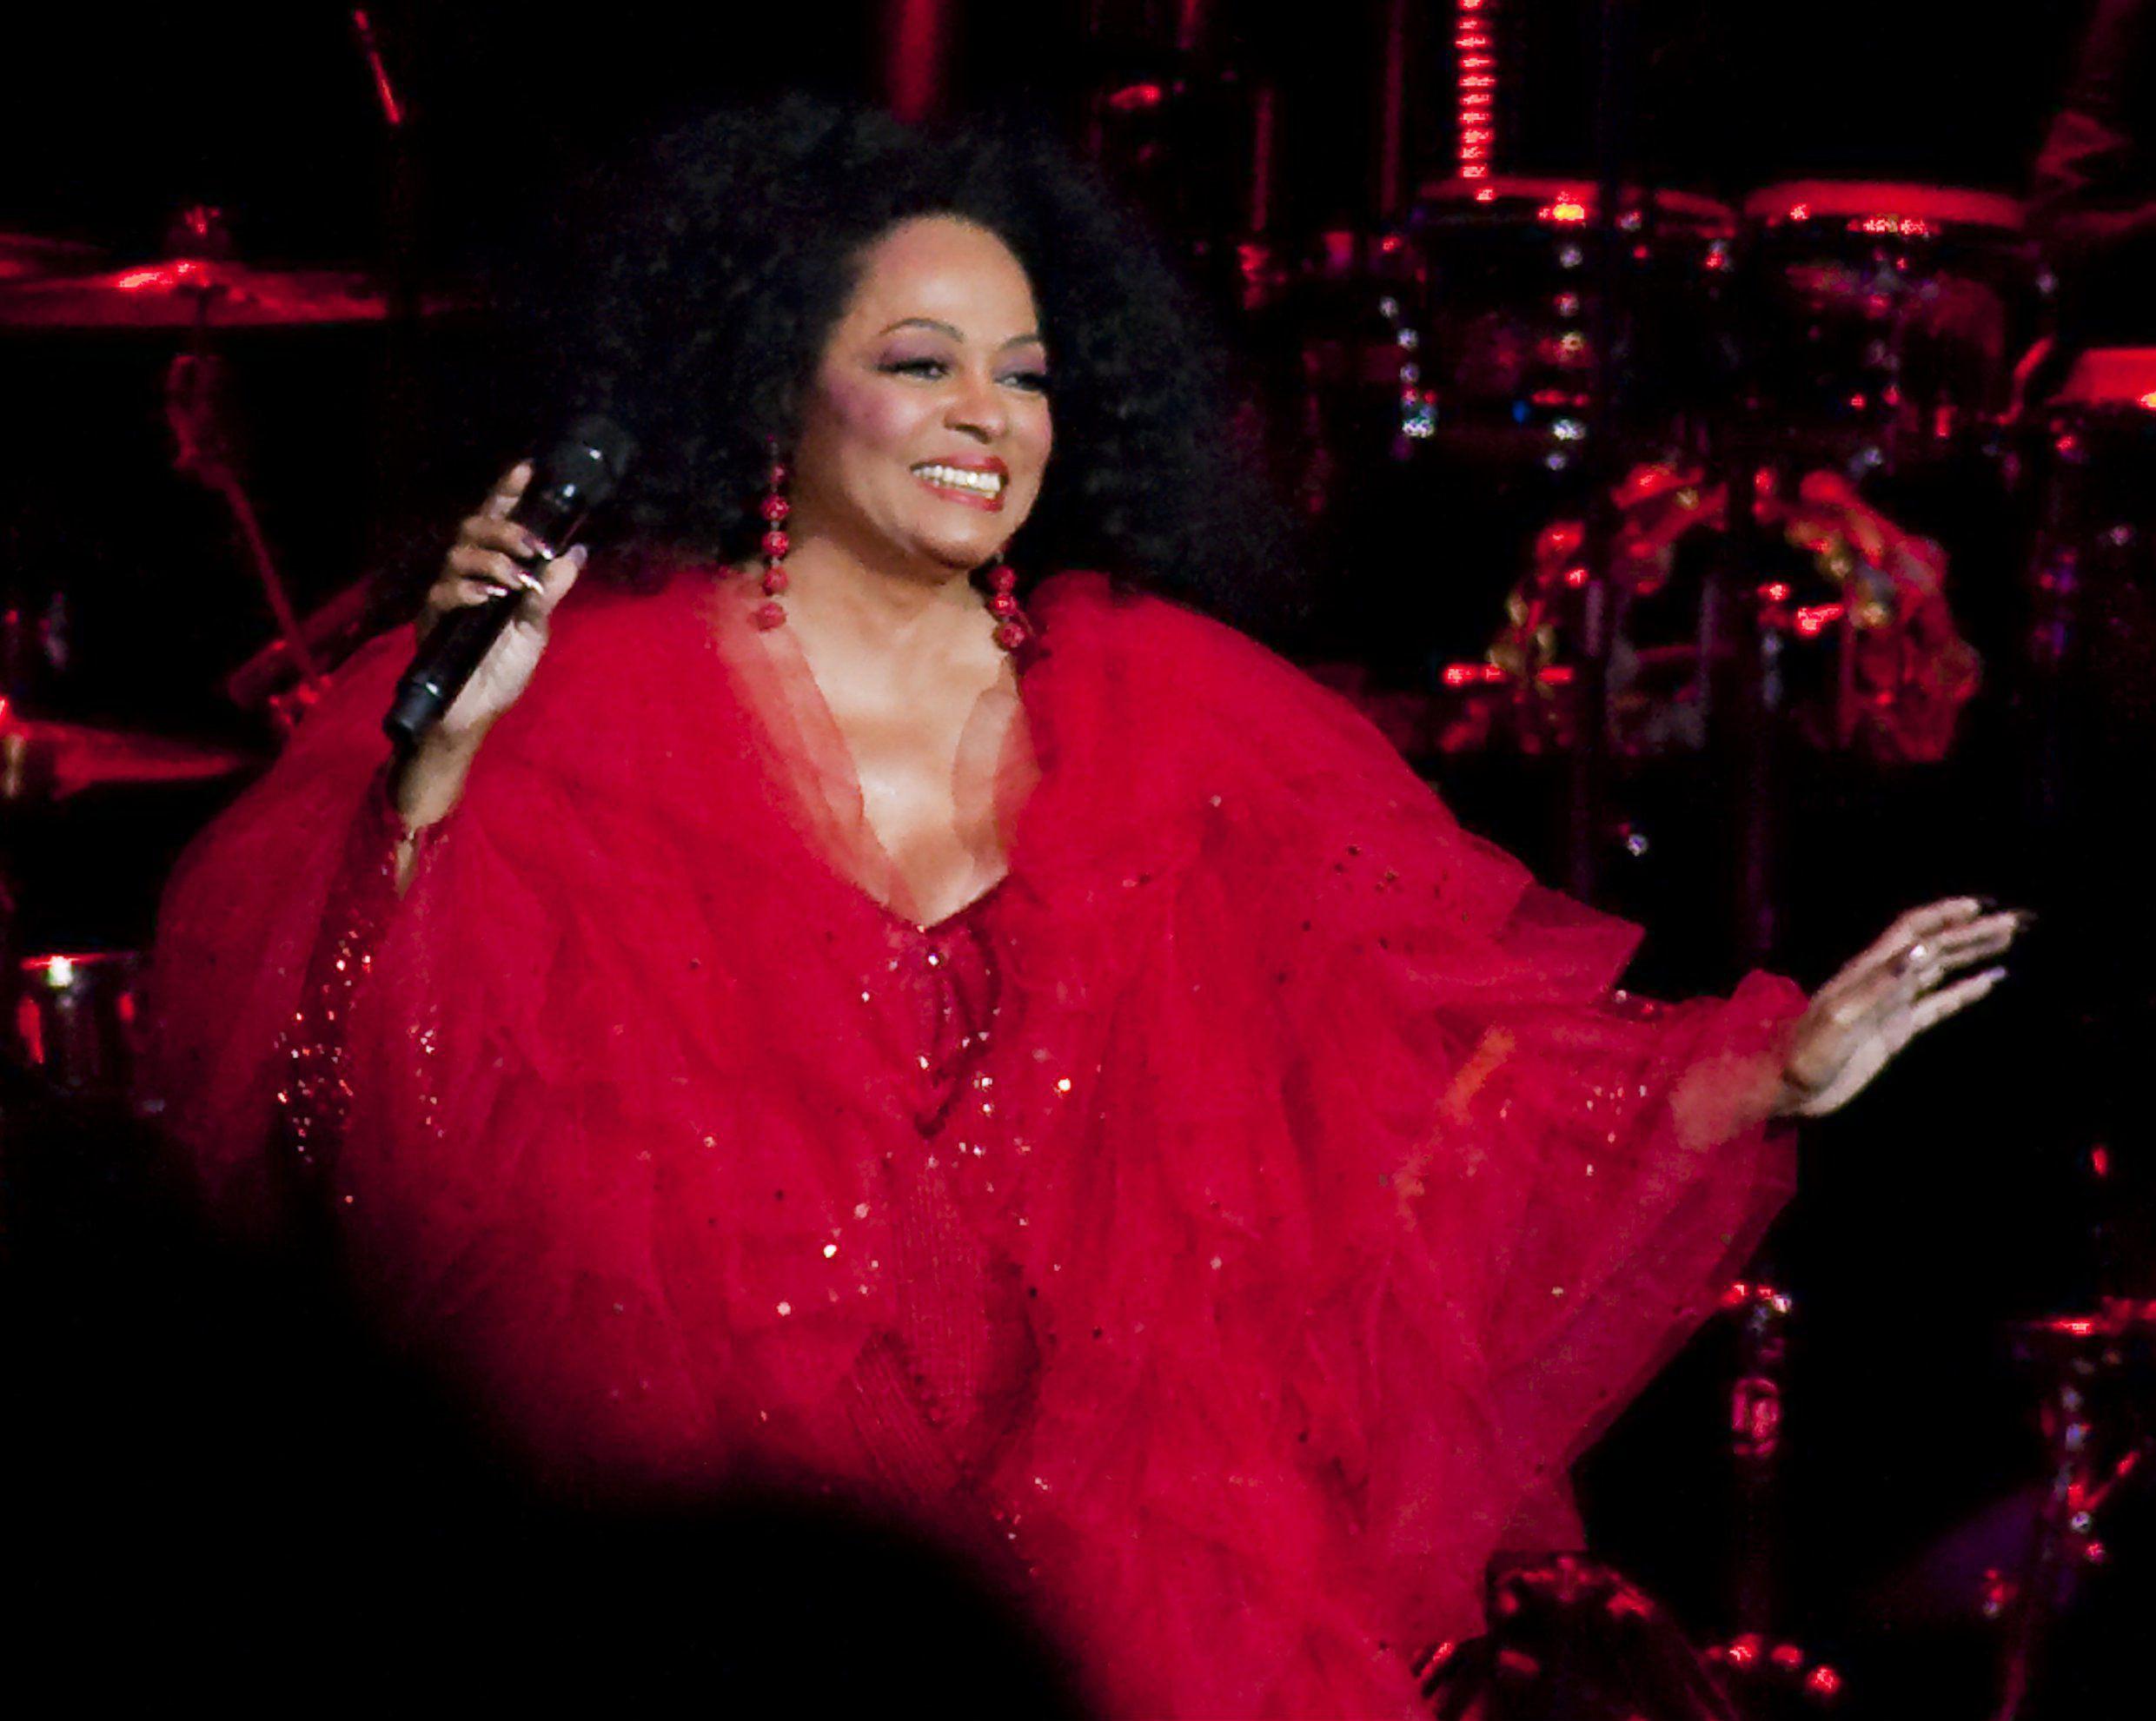 Mandatory Credit: Photo by Startraks Photo/REX/Shutterstock (2990676b)nDiana RossnDiana Ross performing at the Seminole Hard Rock Hotel & Casino, Hollywood, Florida, America - 04 Sep 2013nn